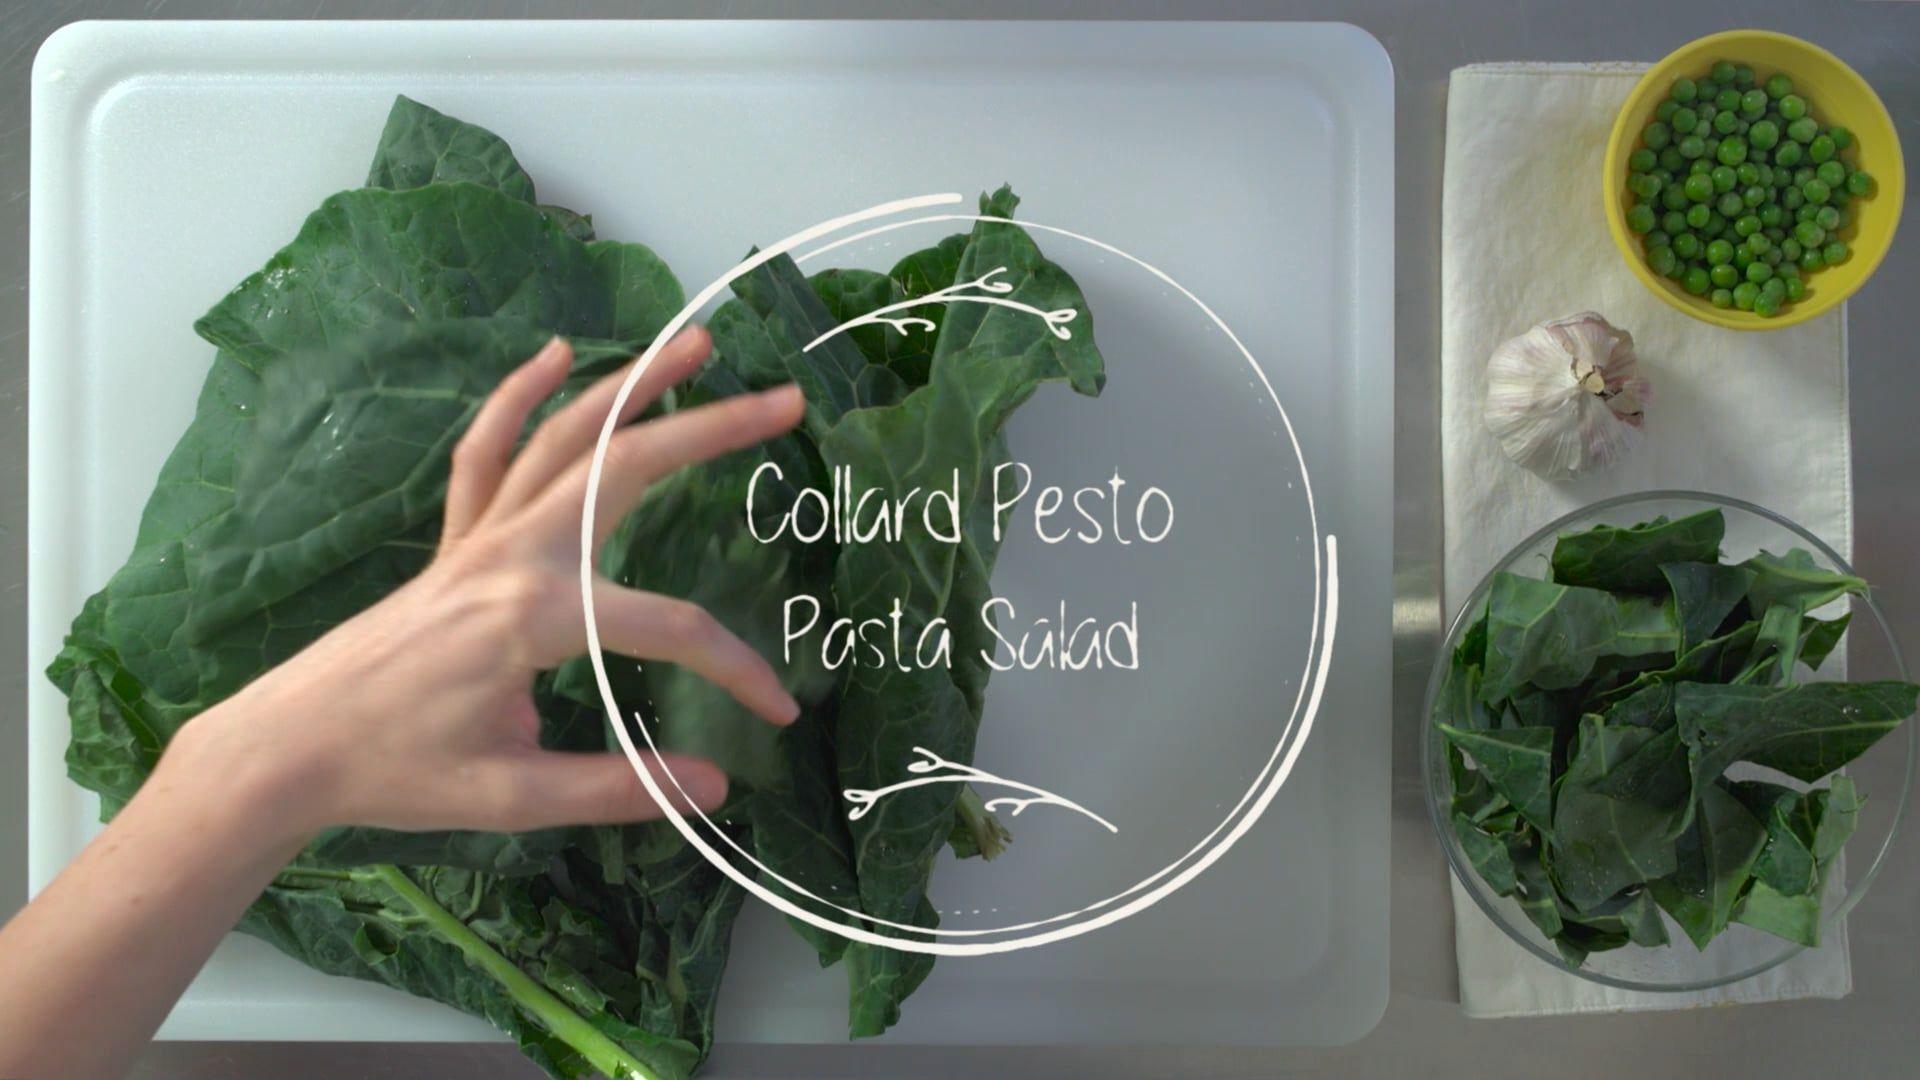 Bitesize: Collard Pesto Pasta Salad